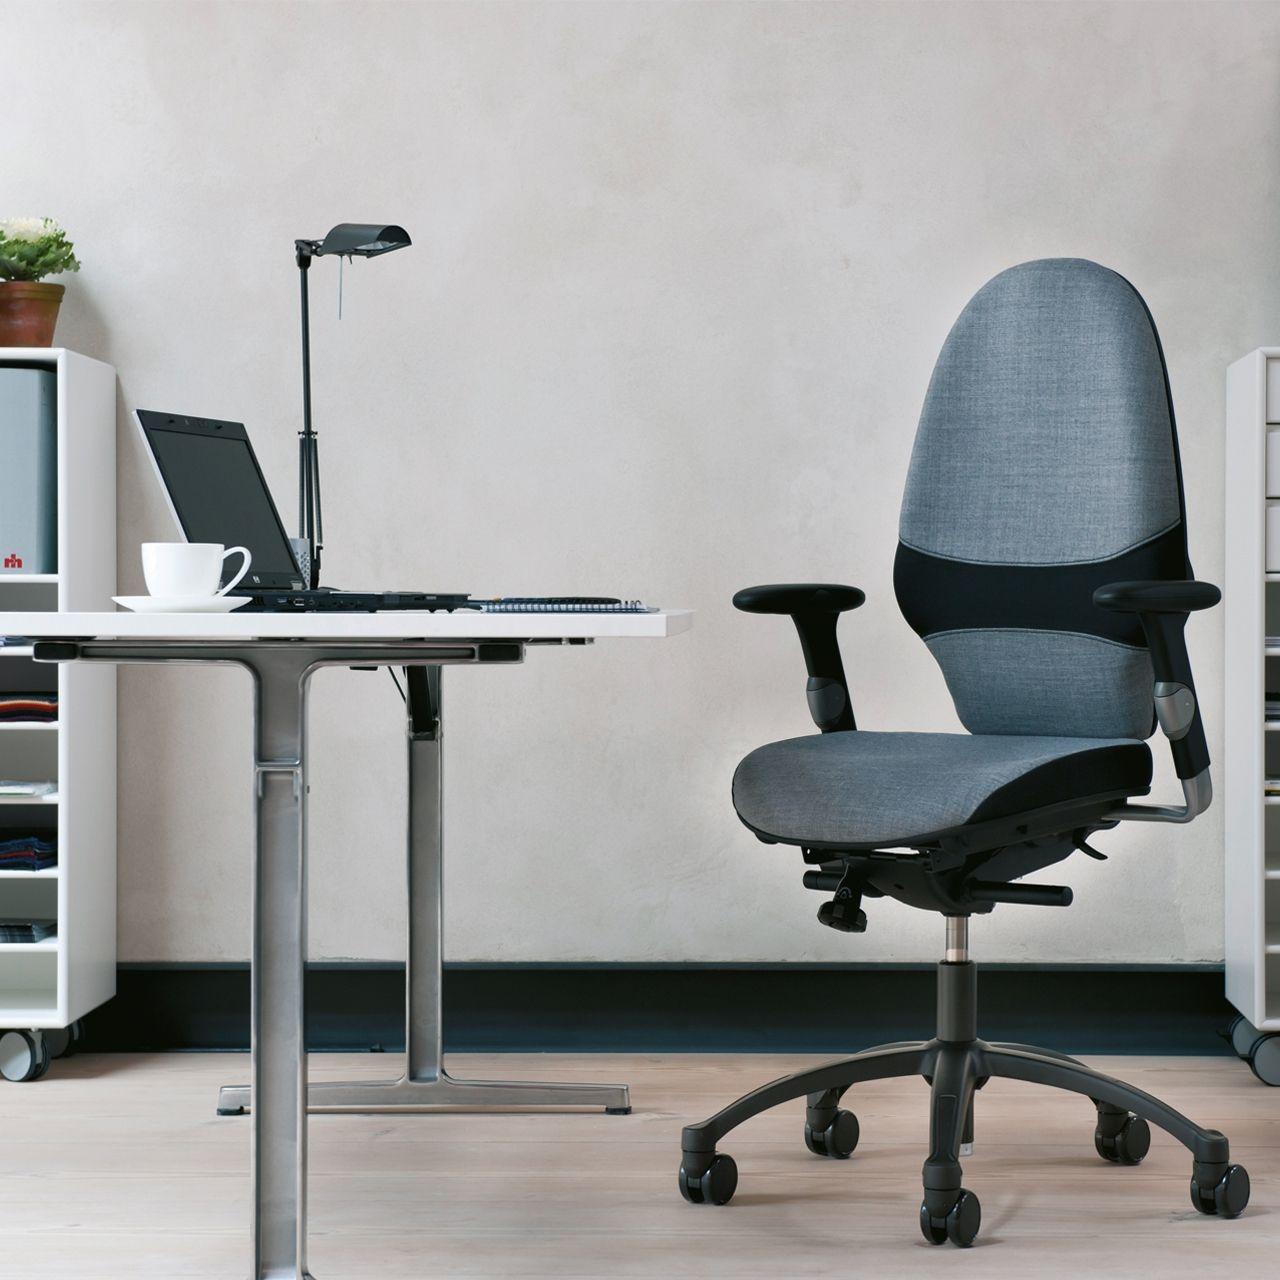 Rh-extend-large-200-bureaustoel-stkaext203_0001_omgeving